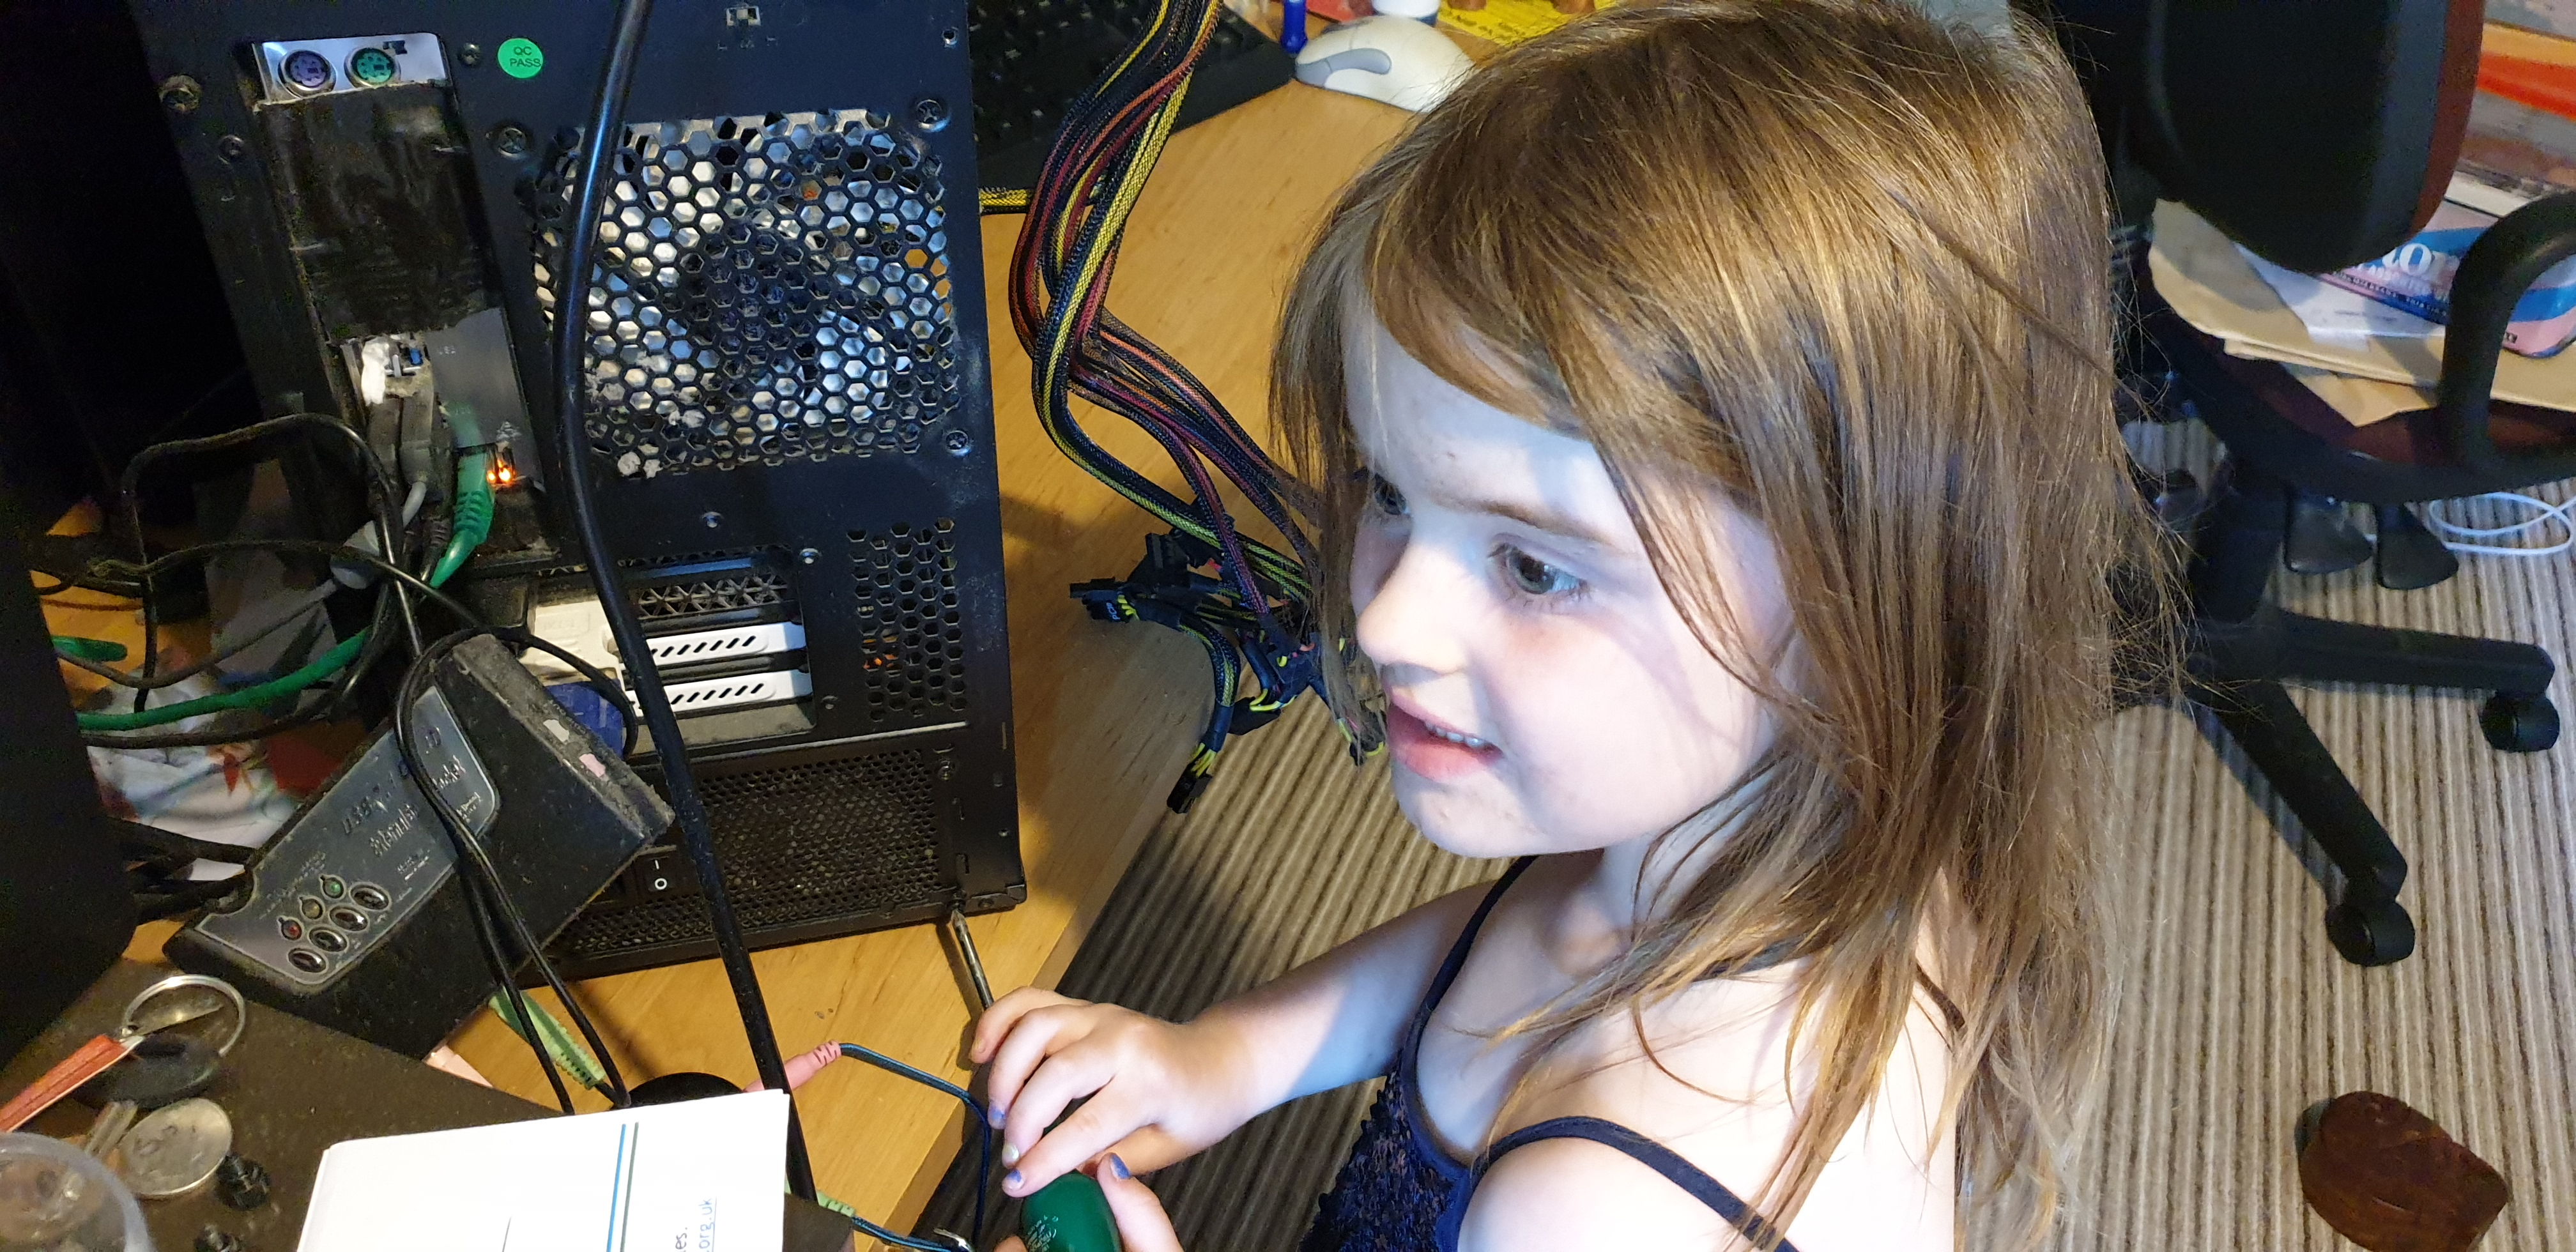 Annabel repairing her mother's computer.